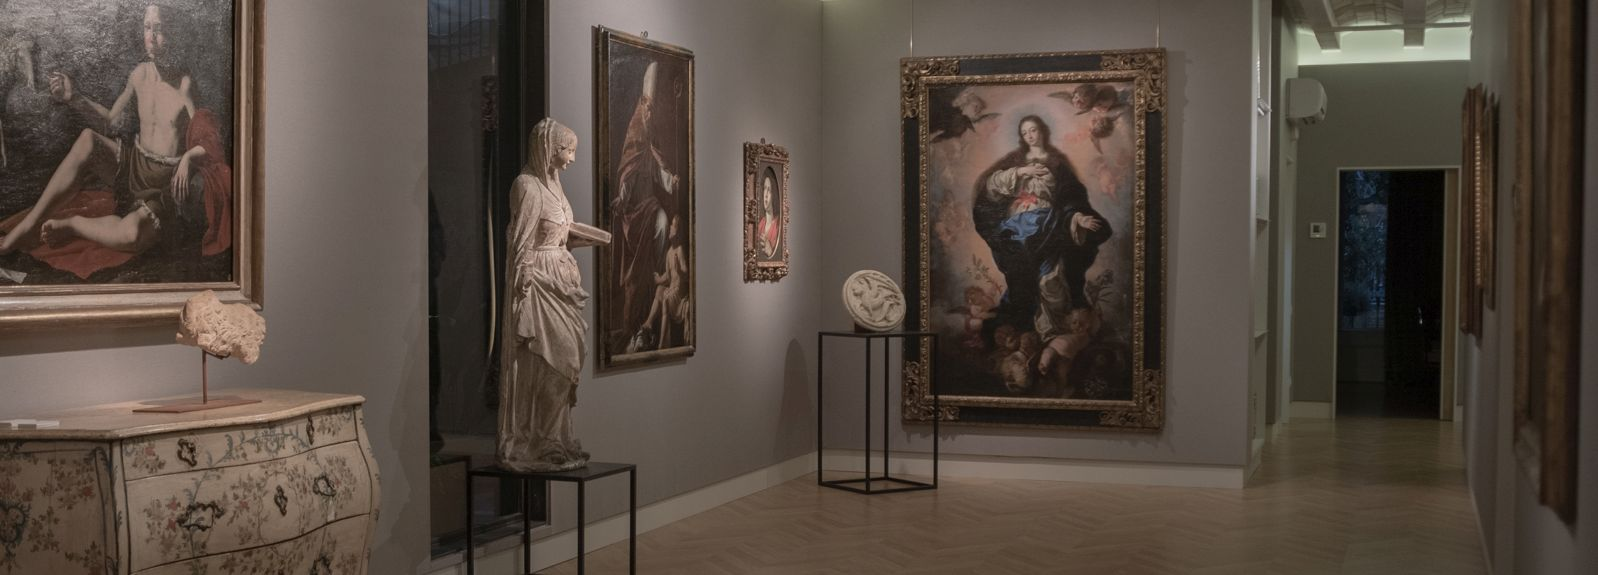 Quatre caravaggistes: Bassetti, Borgianni, Caracciolo i Ribera